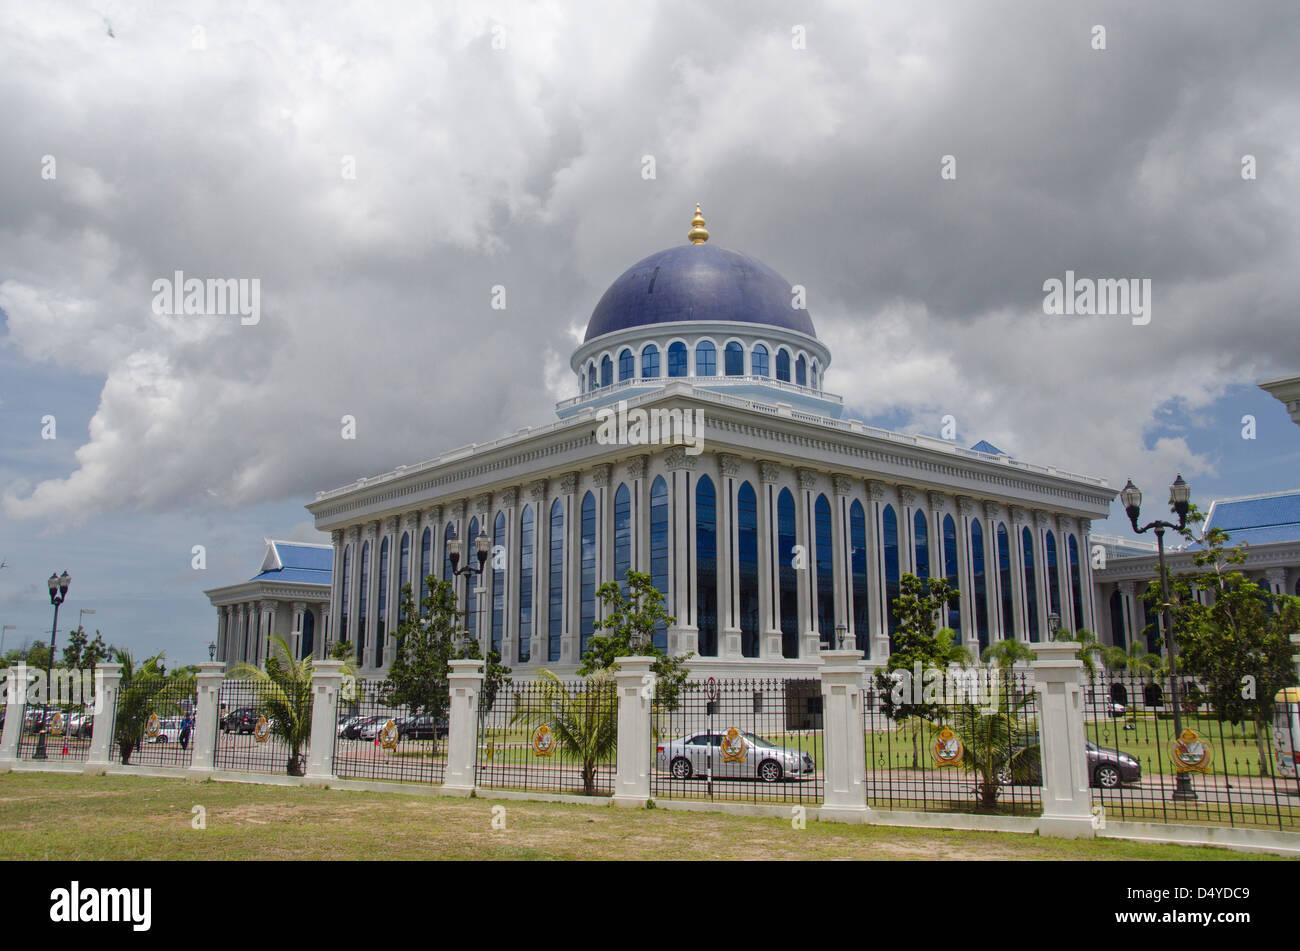 Borneo, Brunei. Capital city of Bandar Seri Begawan, legislative assembly building where parliament meets. - Stock Image